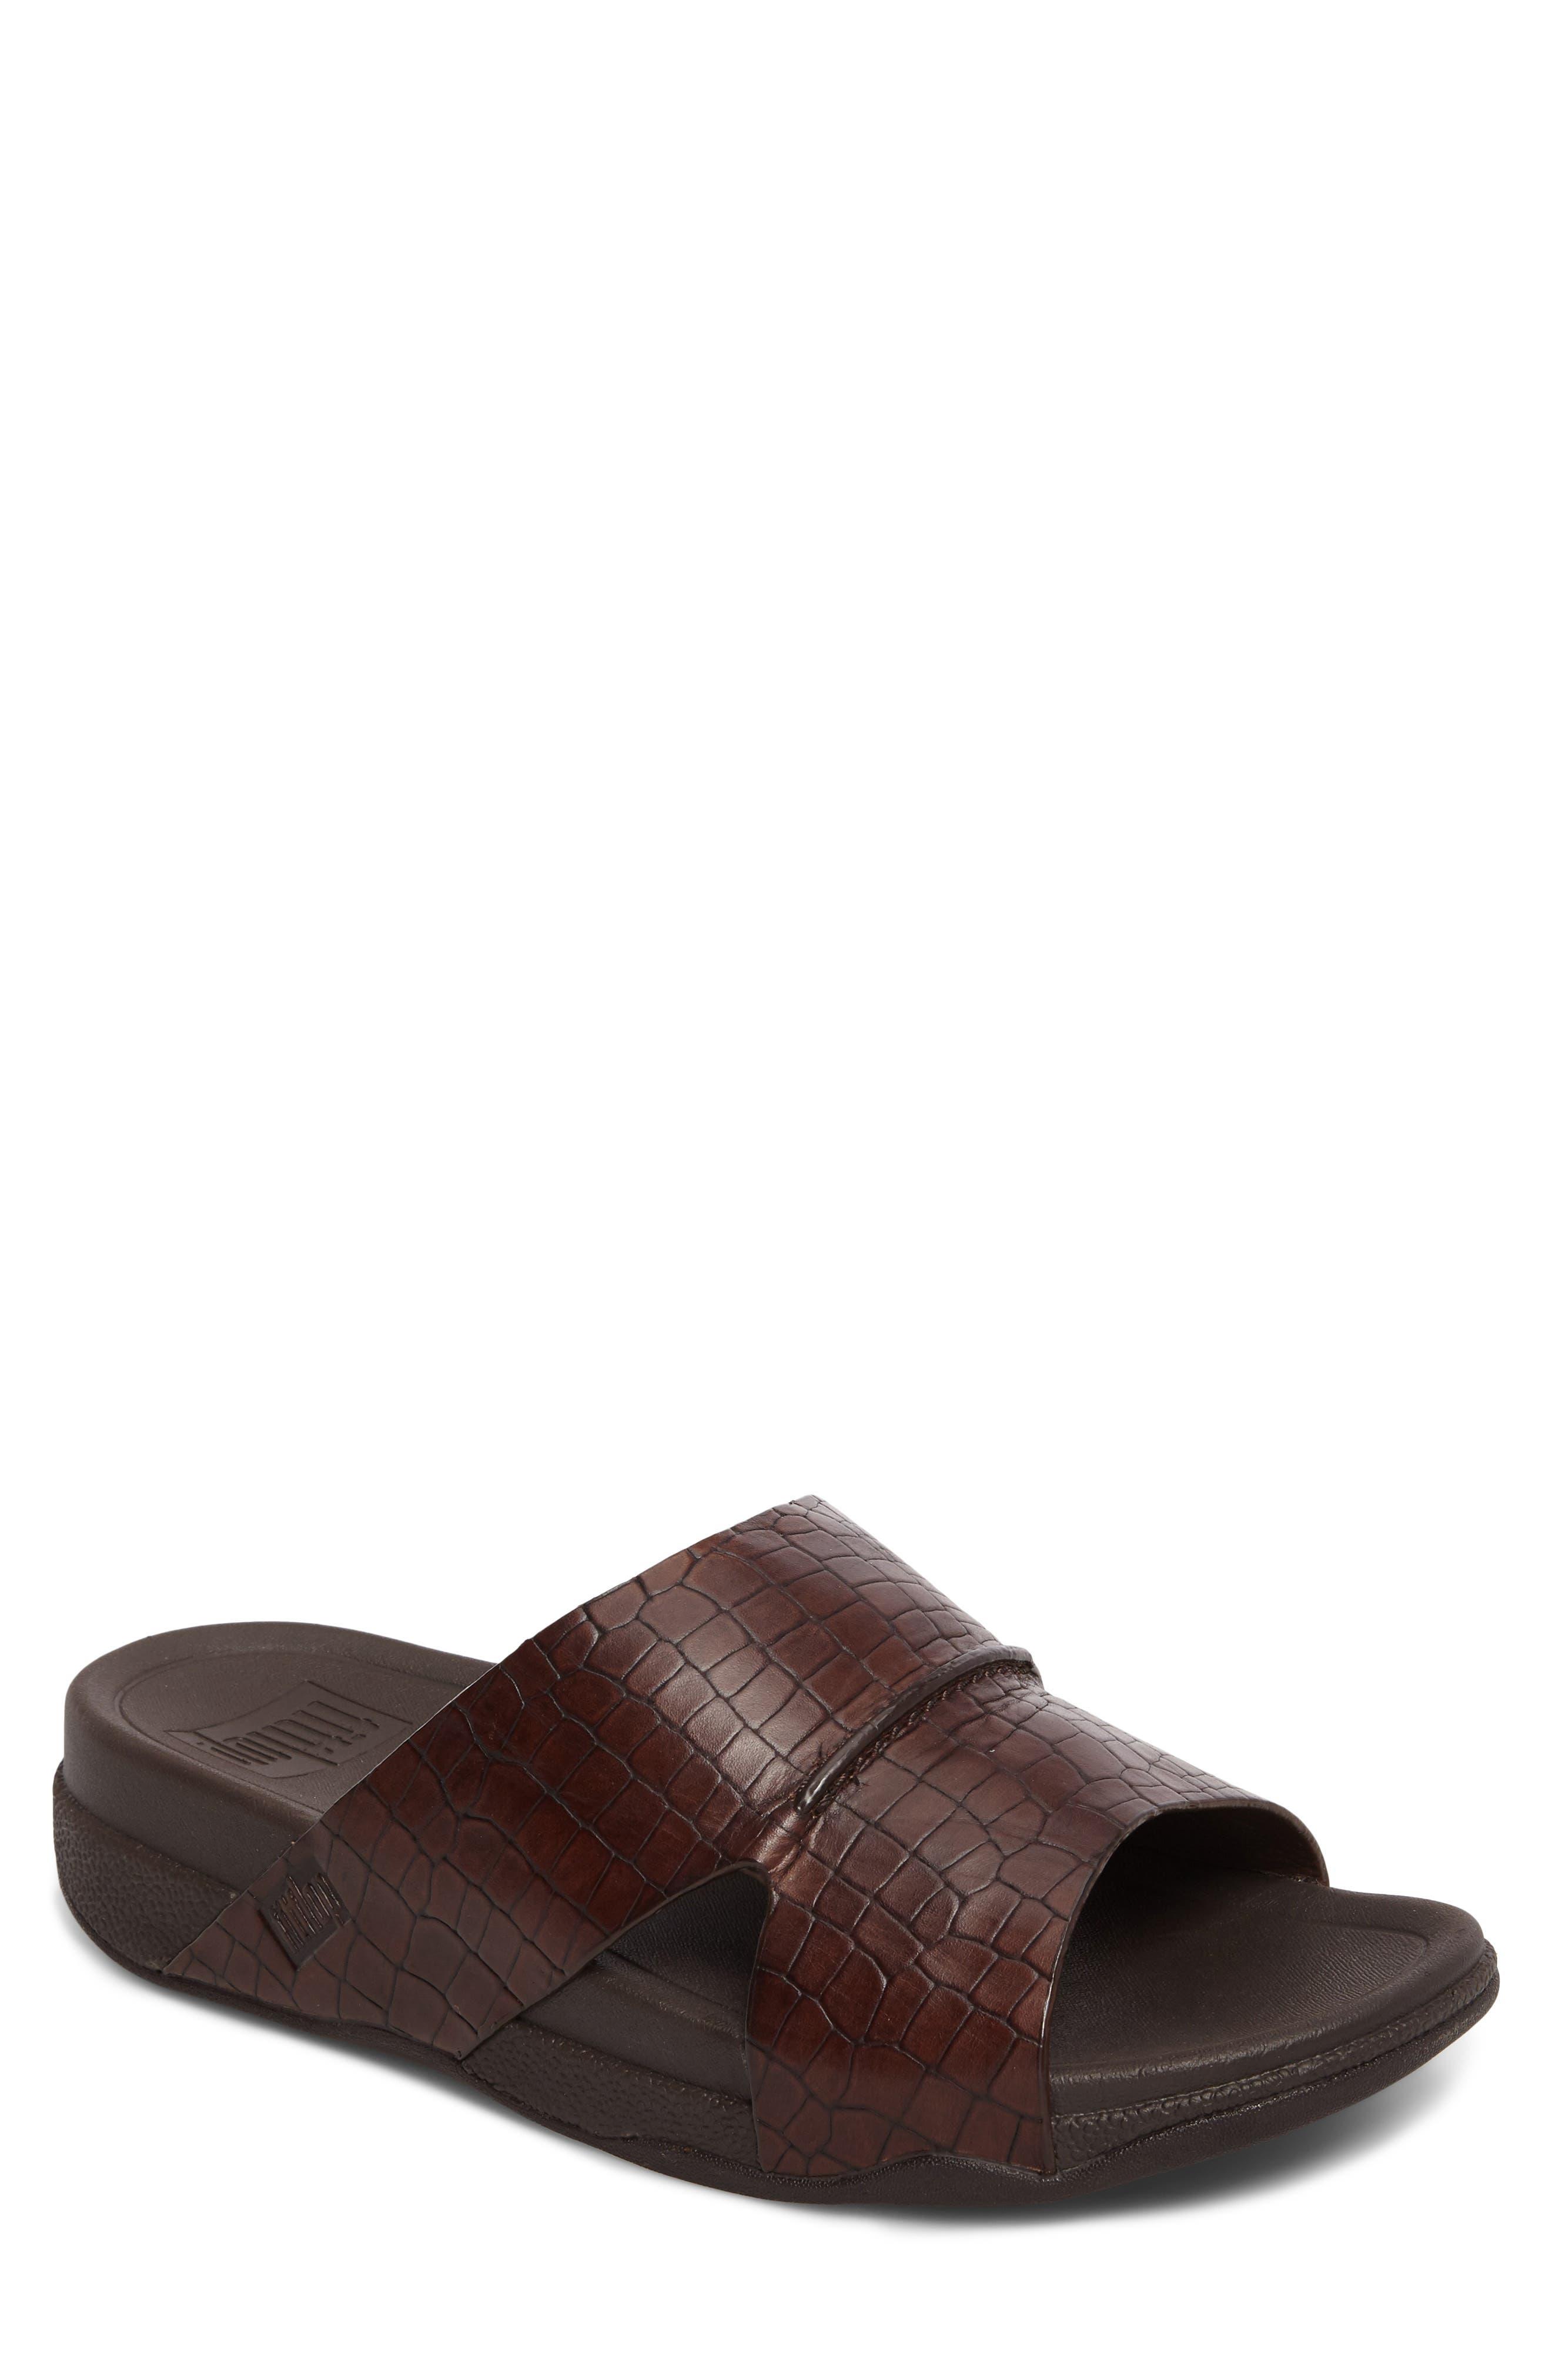 Bando Slide Sandal,                         Main,                         color, CHOCOLATE LEATHER